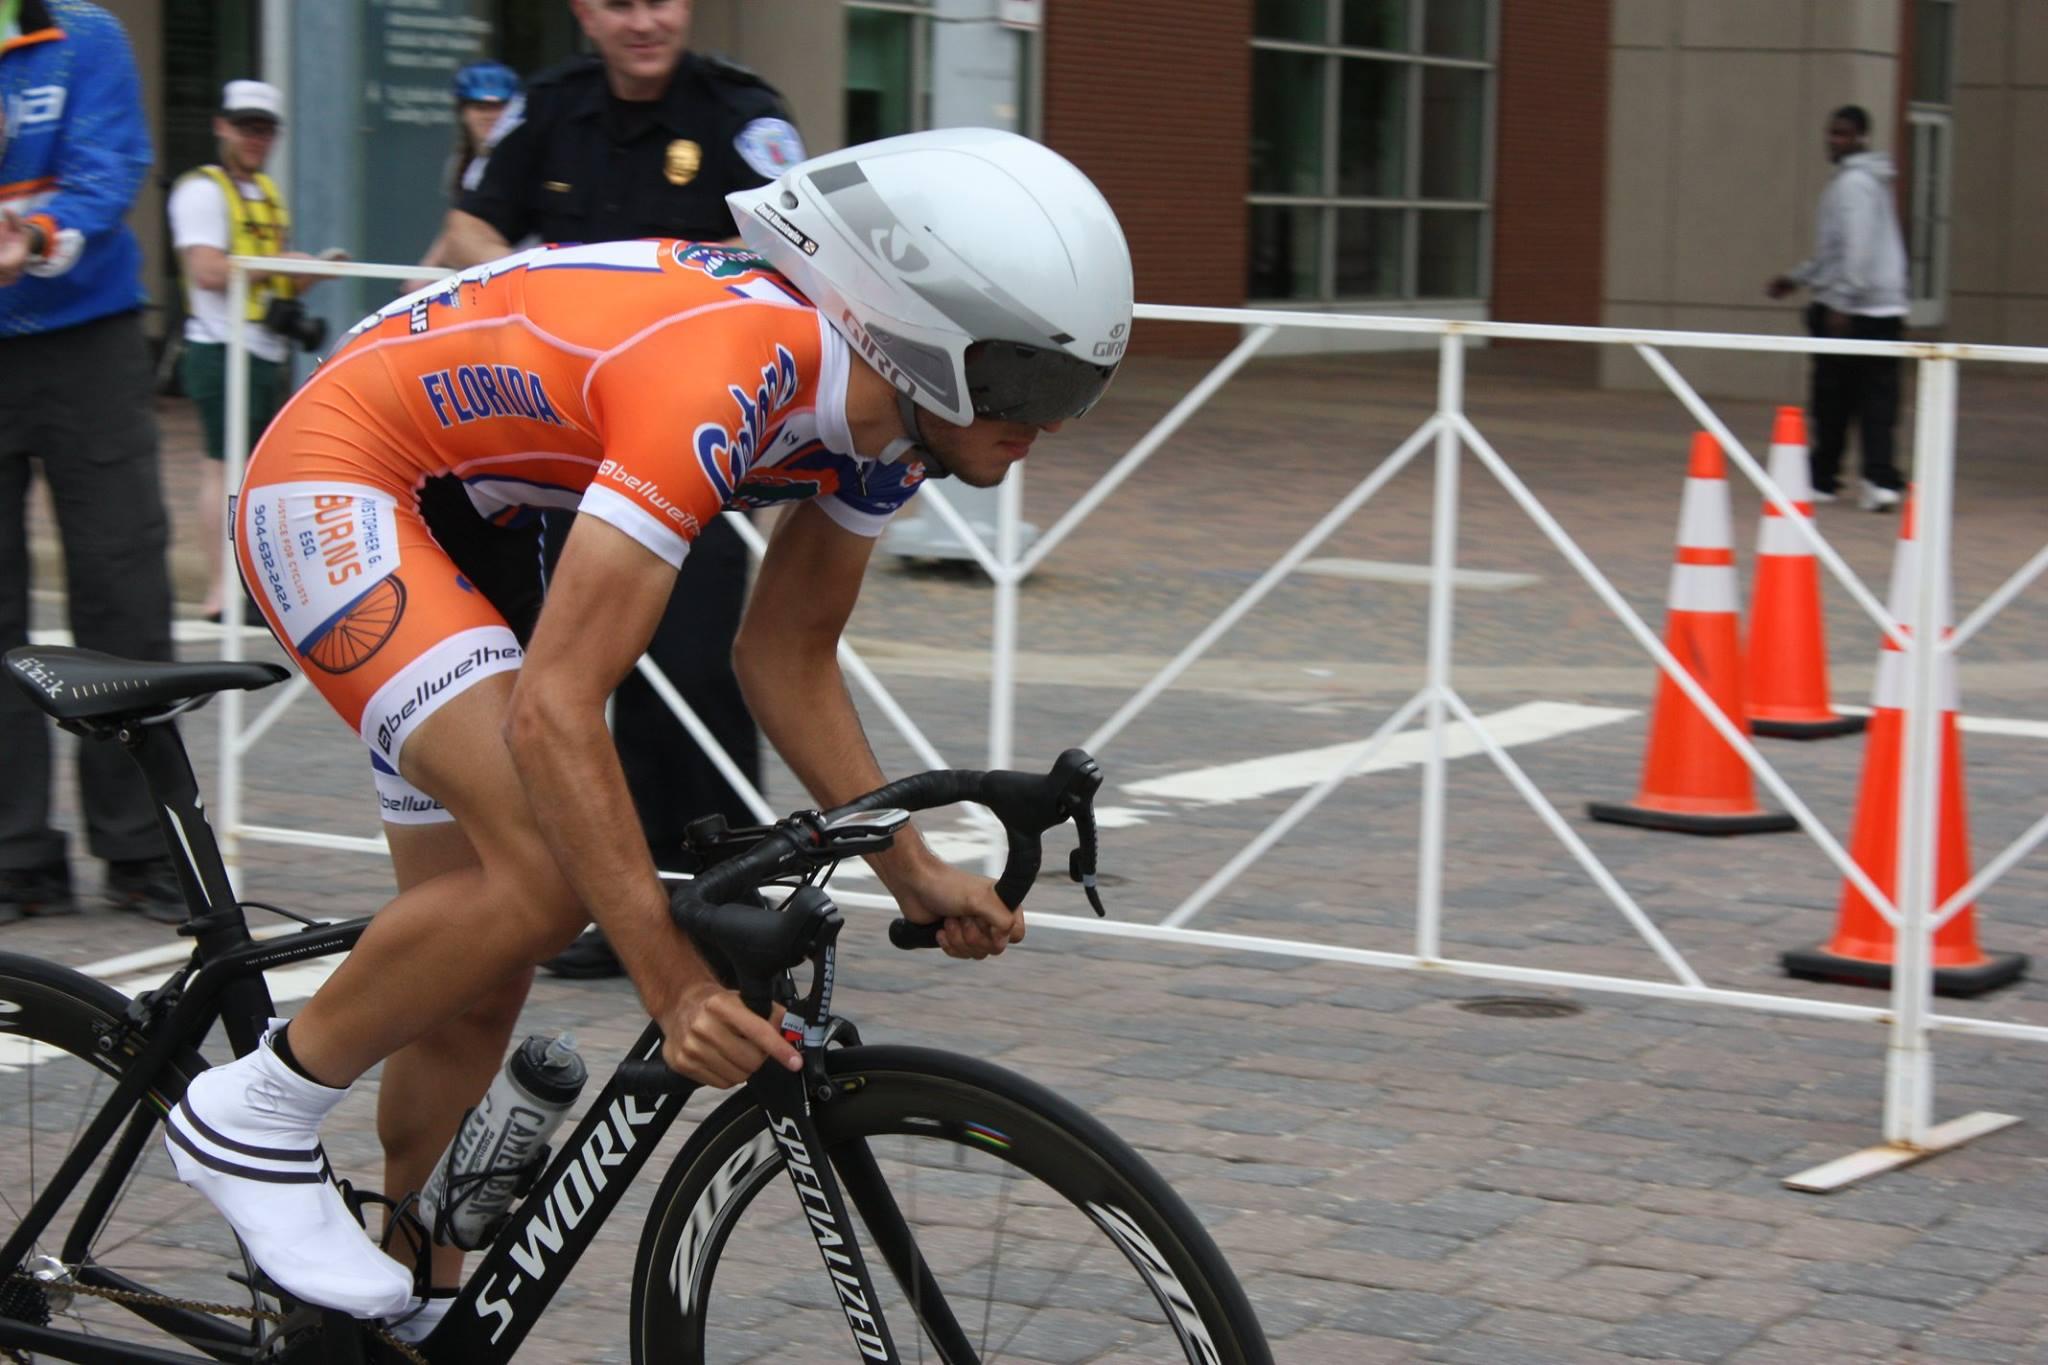 Chris Burns Sponsors University of Florida Cycling Team